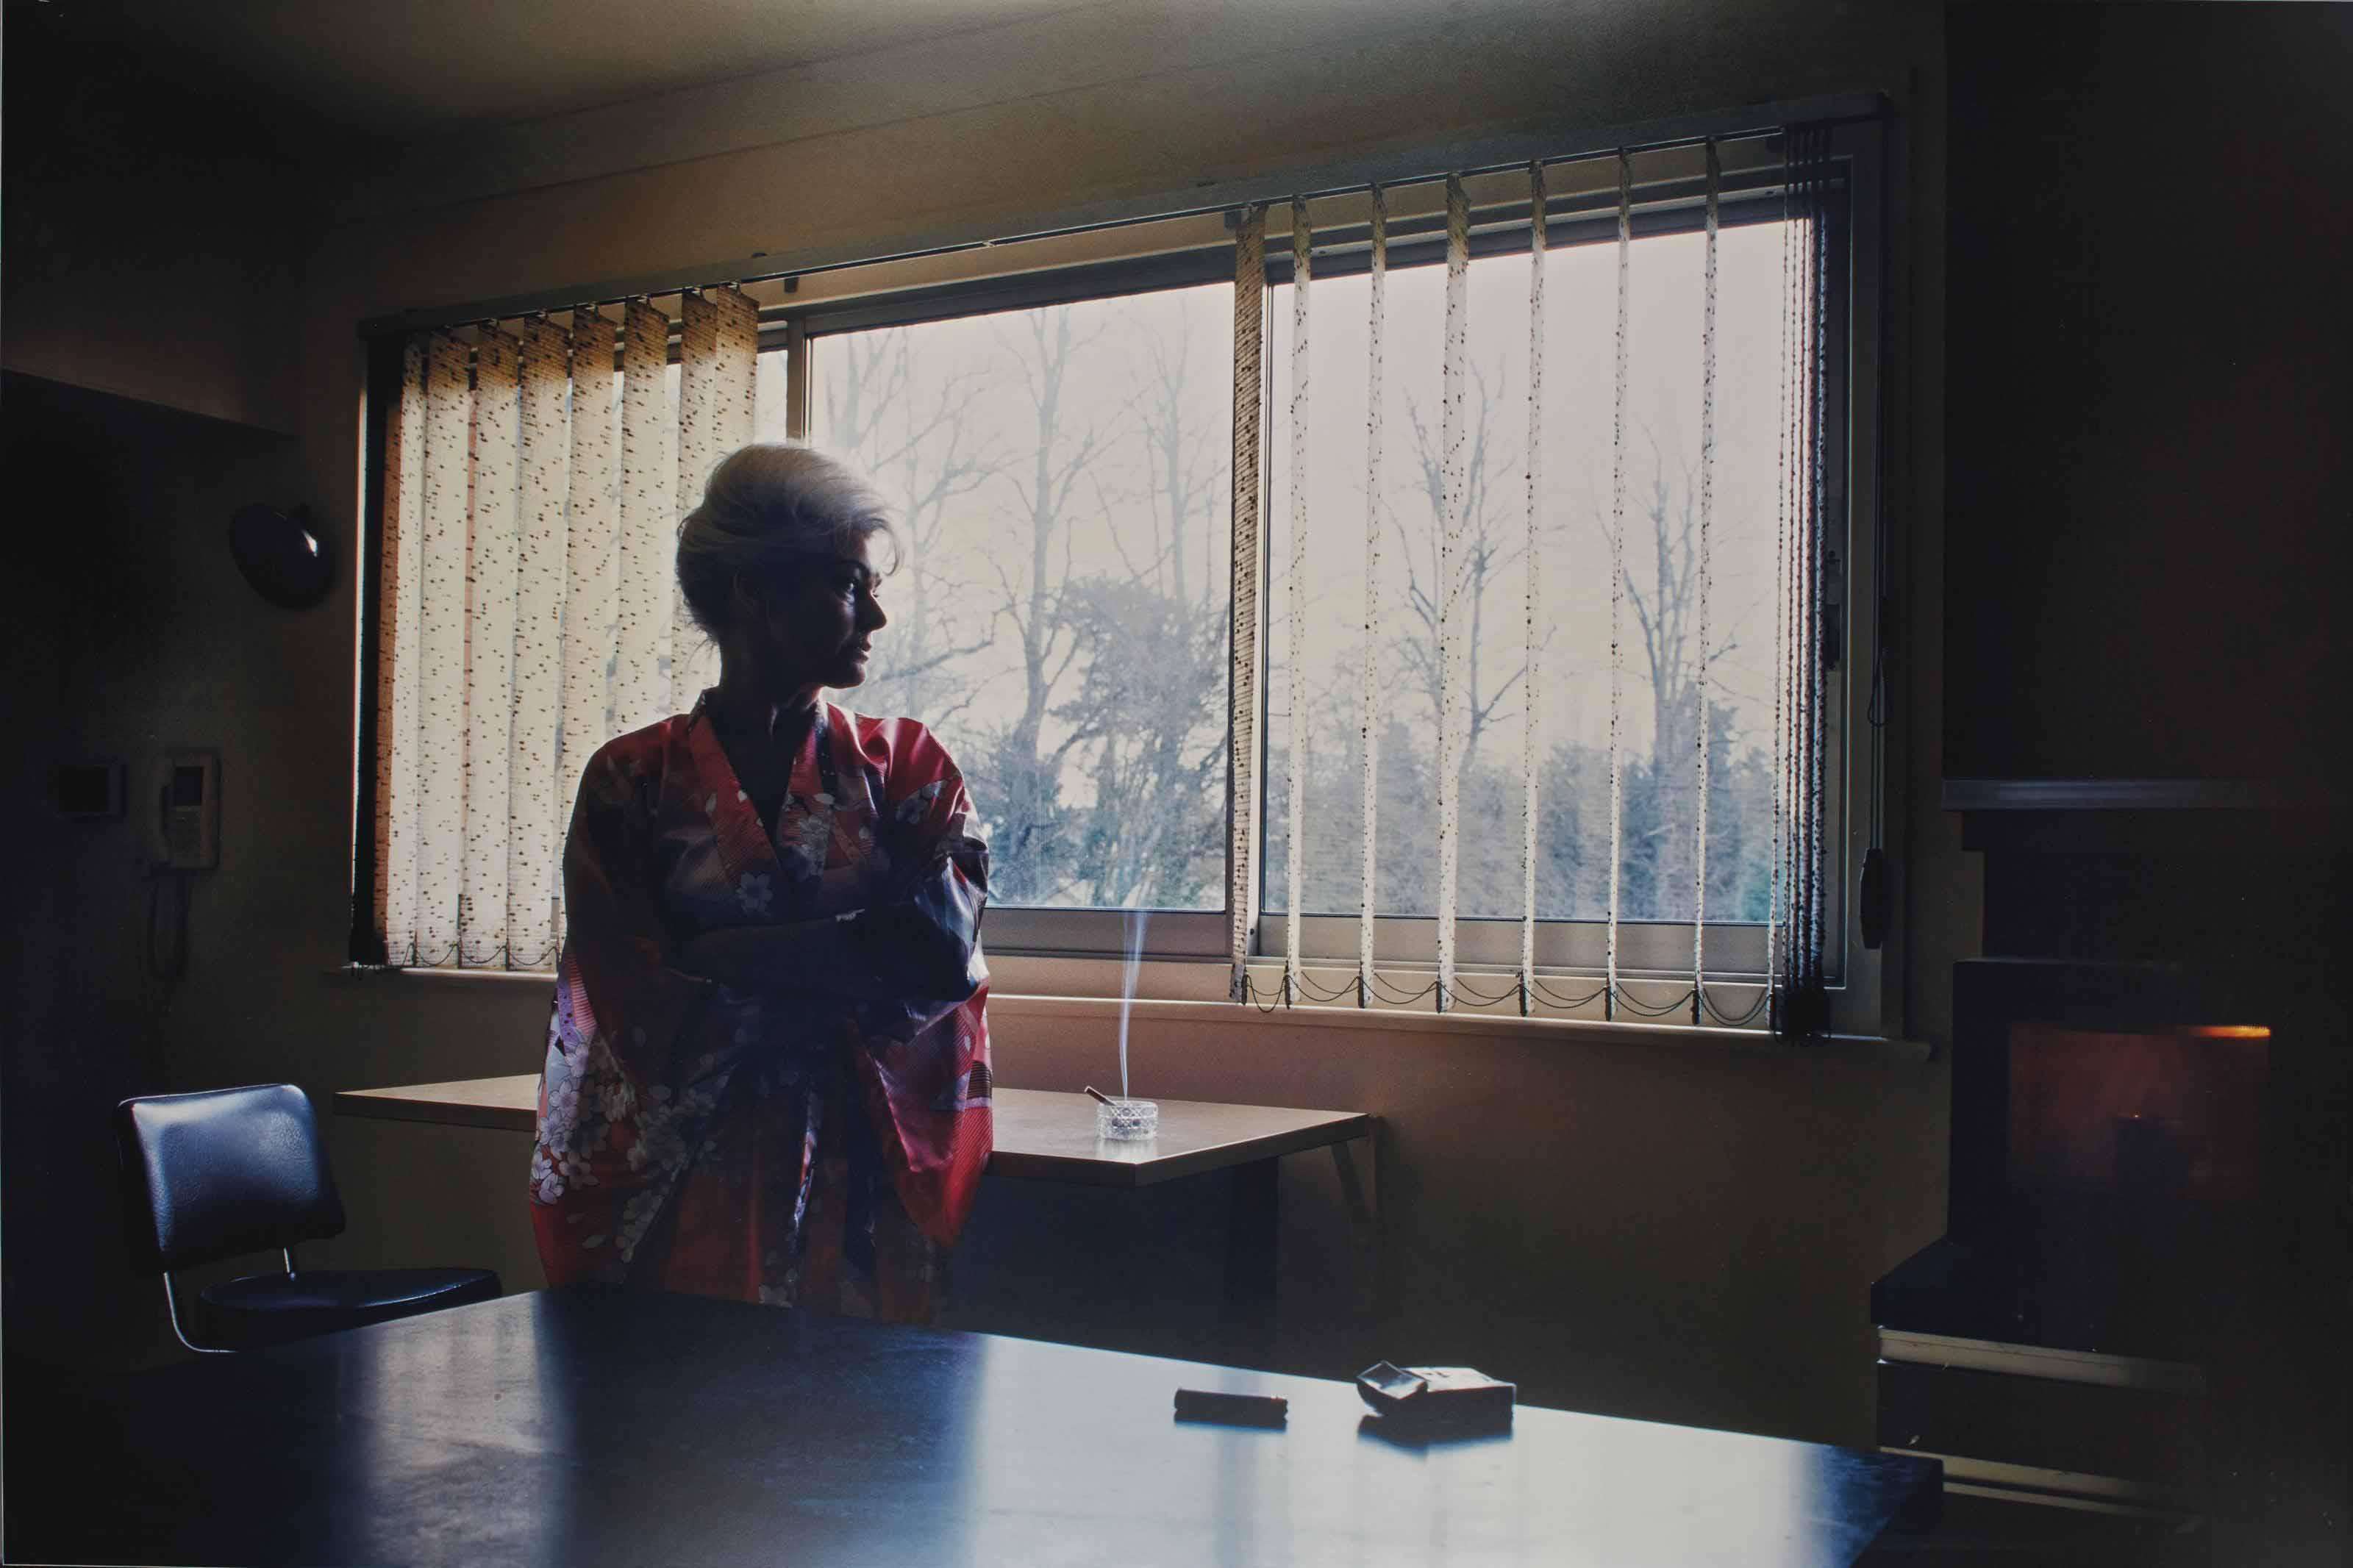 Kitchen - January 2001